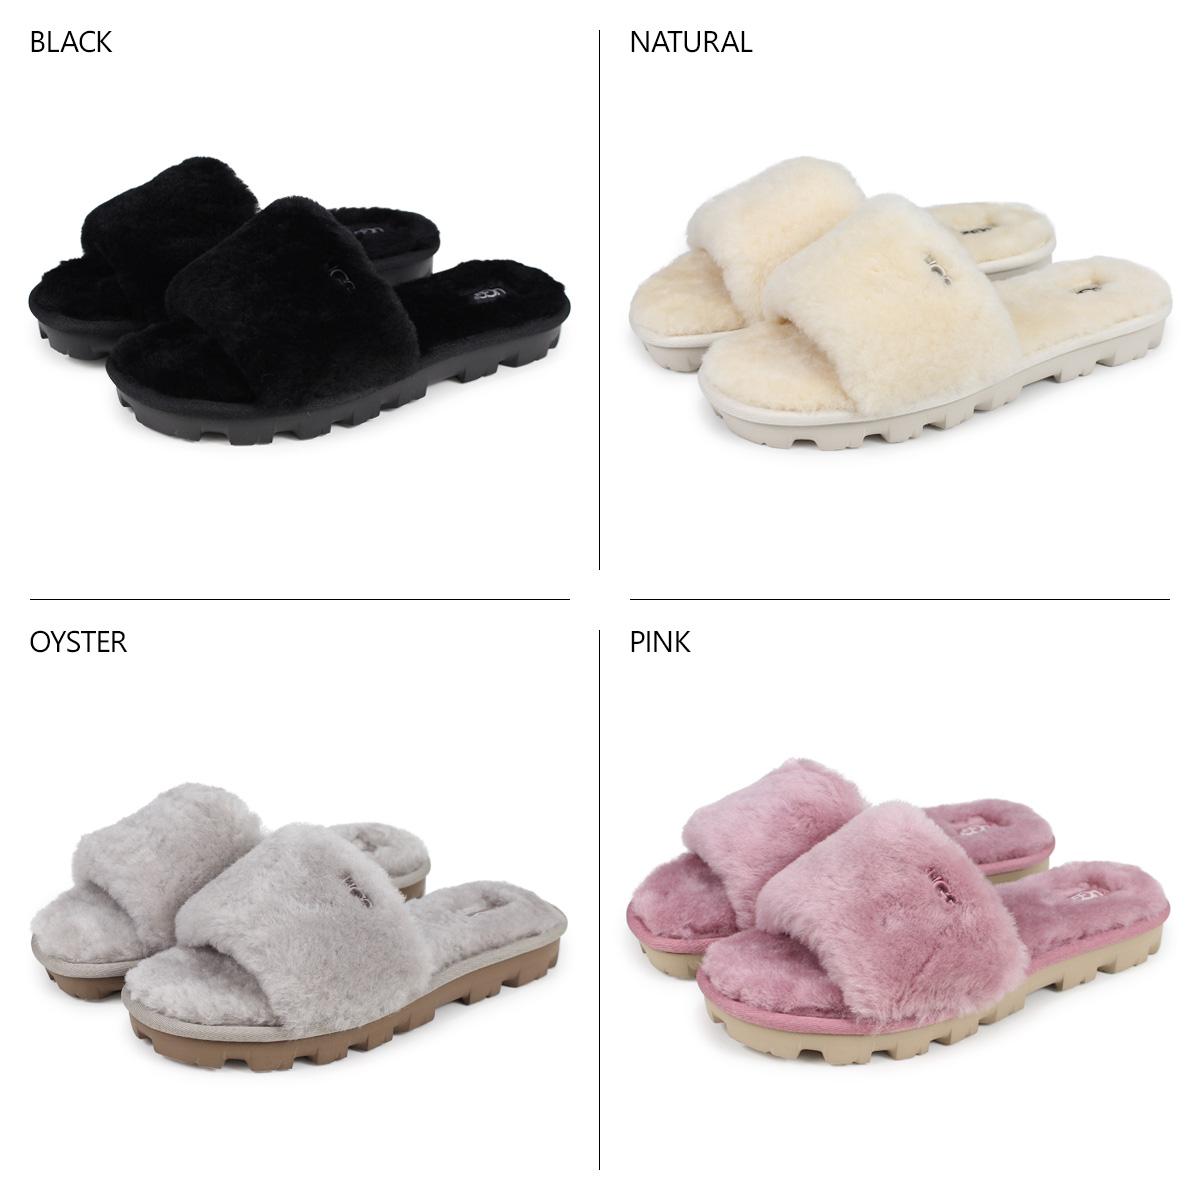 f3e6e16b77ce アグ UGG sandals farce ride sandals Cosette Lady s mouton sheepskin WOMENS  COZETTE 1100892  1 18 Shinnyu load